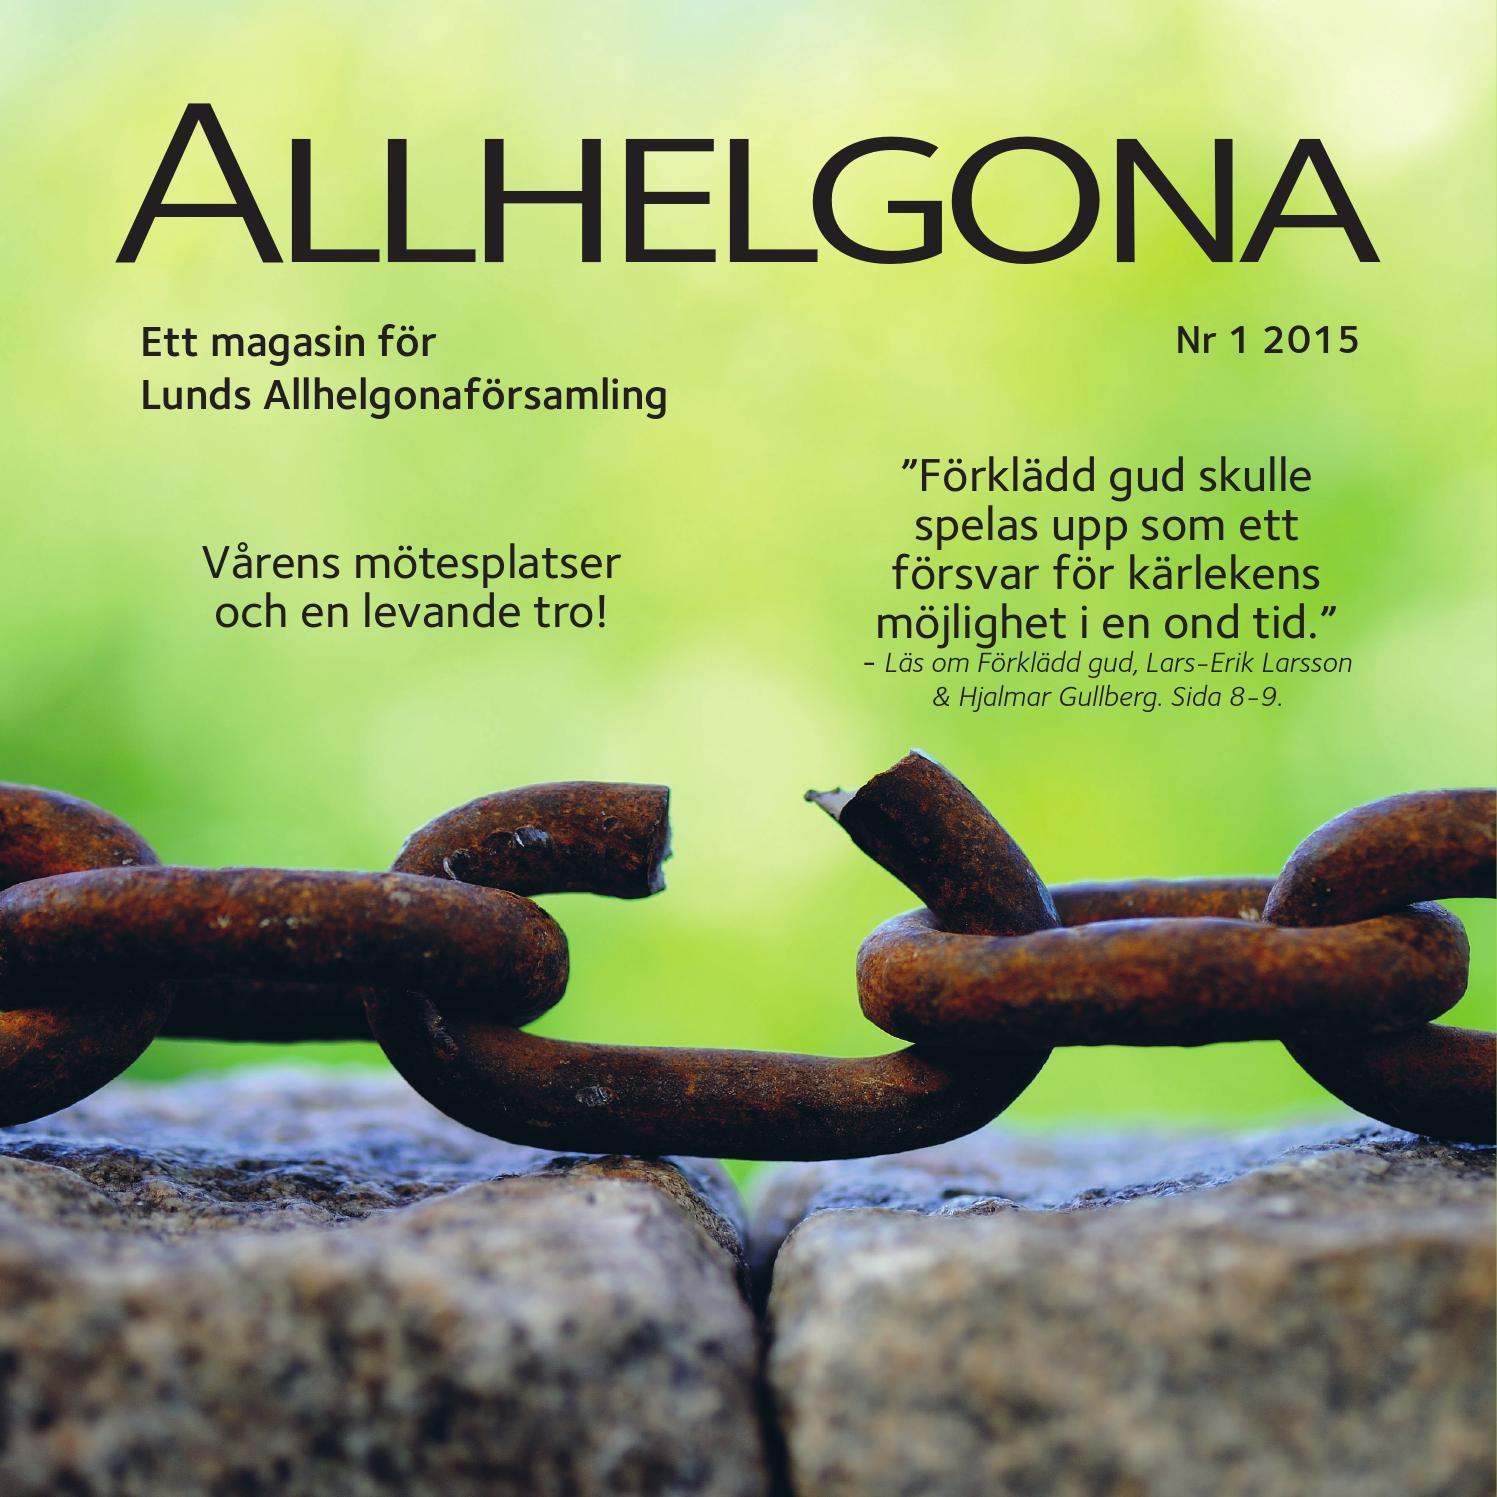 Allhelgona